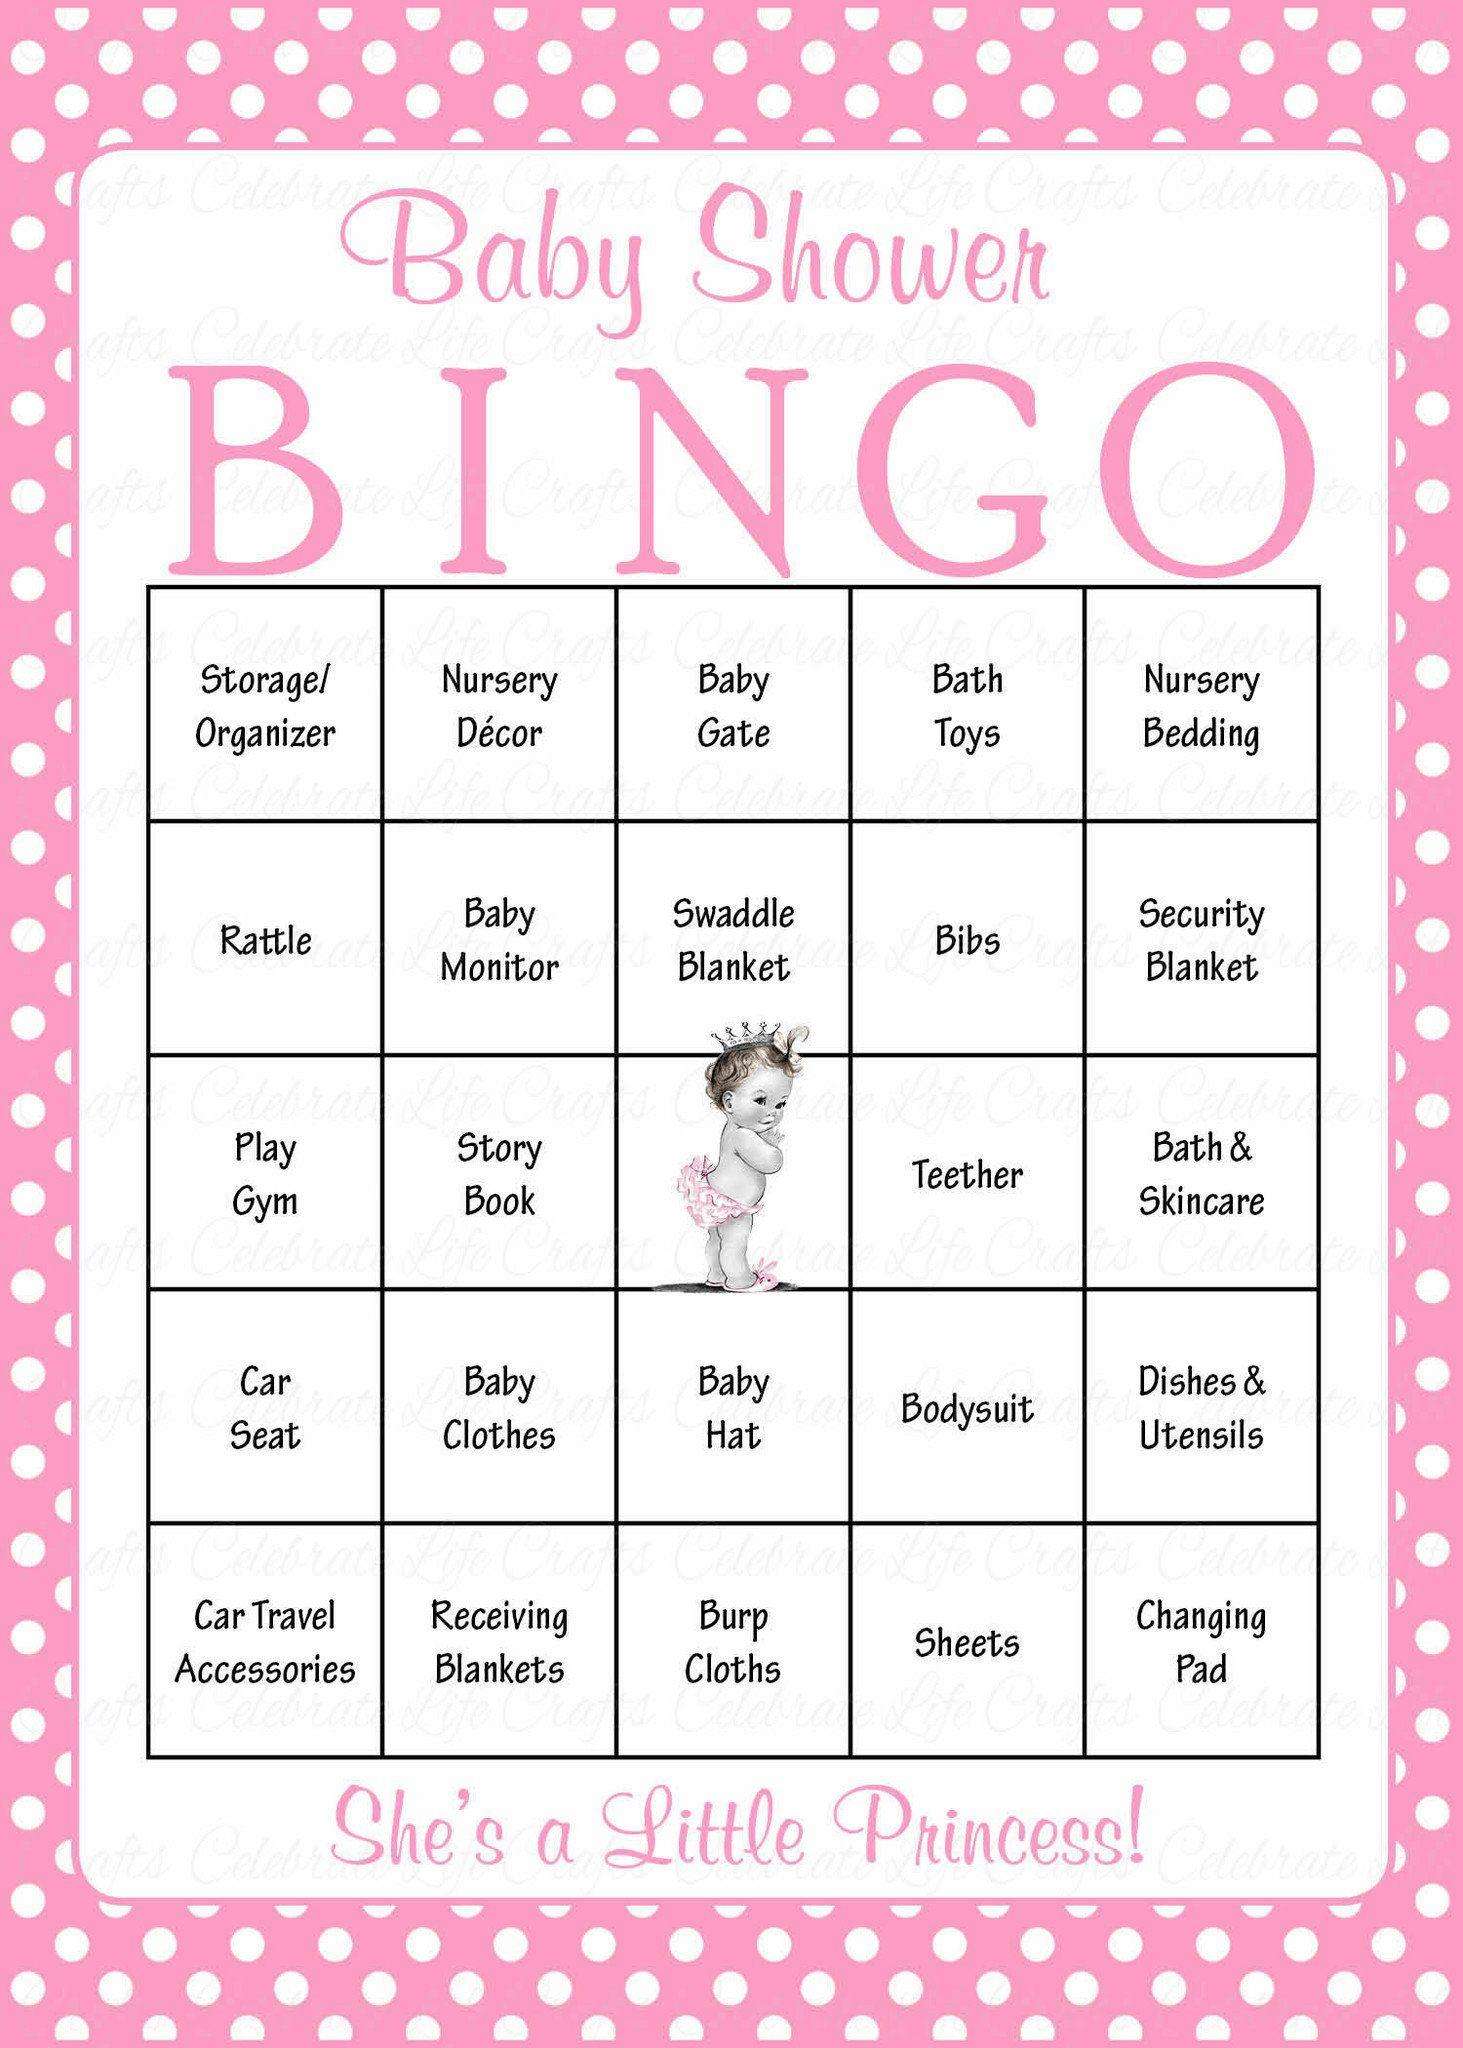 Princess Baby Bingo Cards - Printable Download - Prefilled